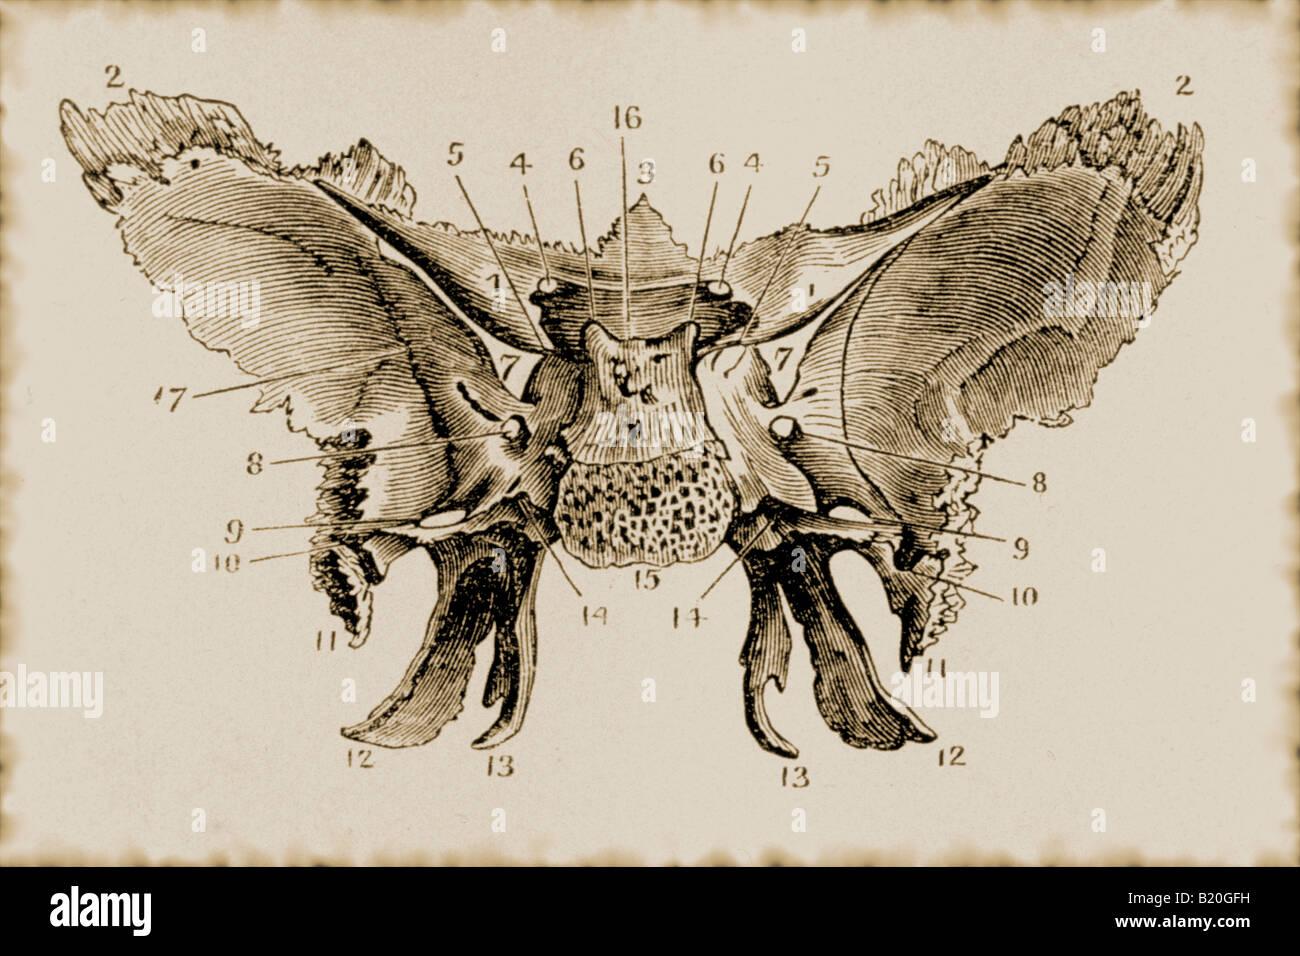 Sphenoid Bone Stockfotos & Sphenoid Bone Bilder - Alamy